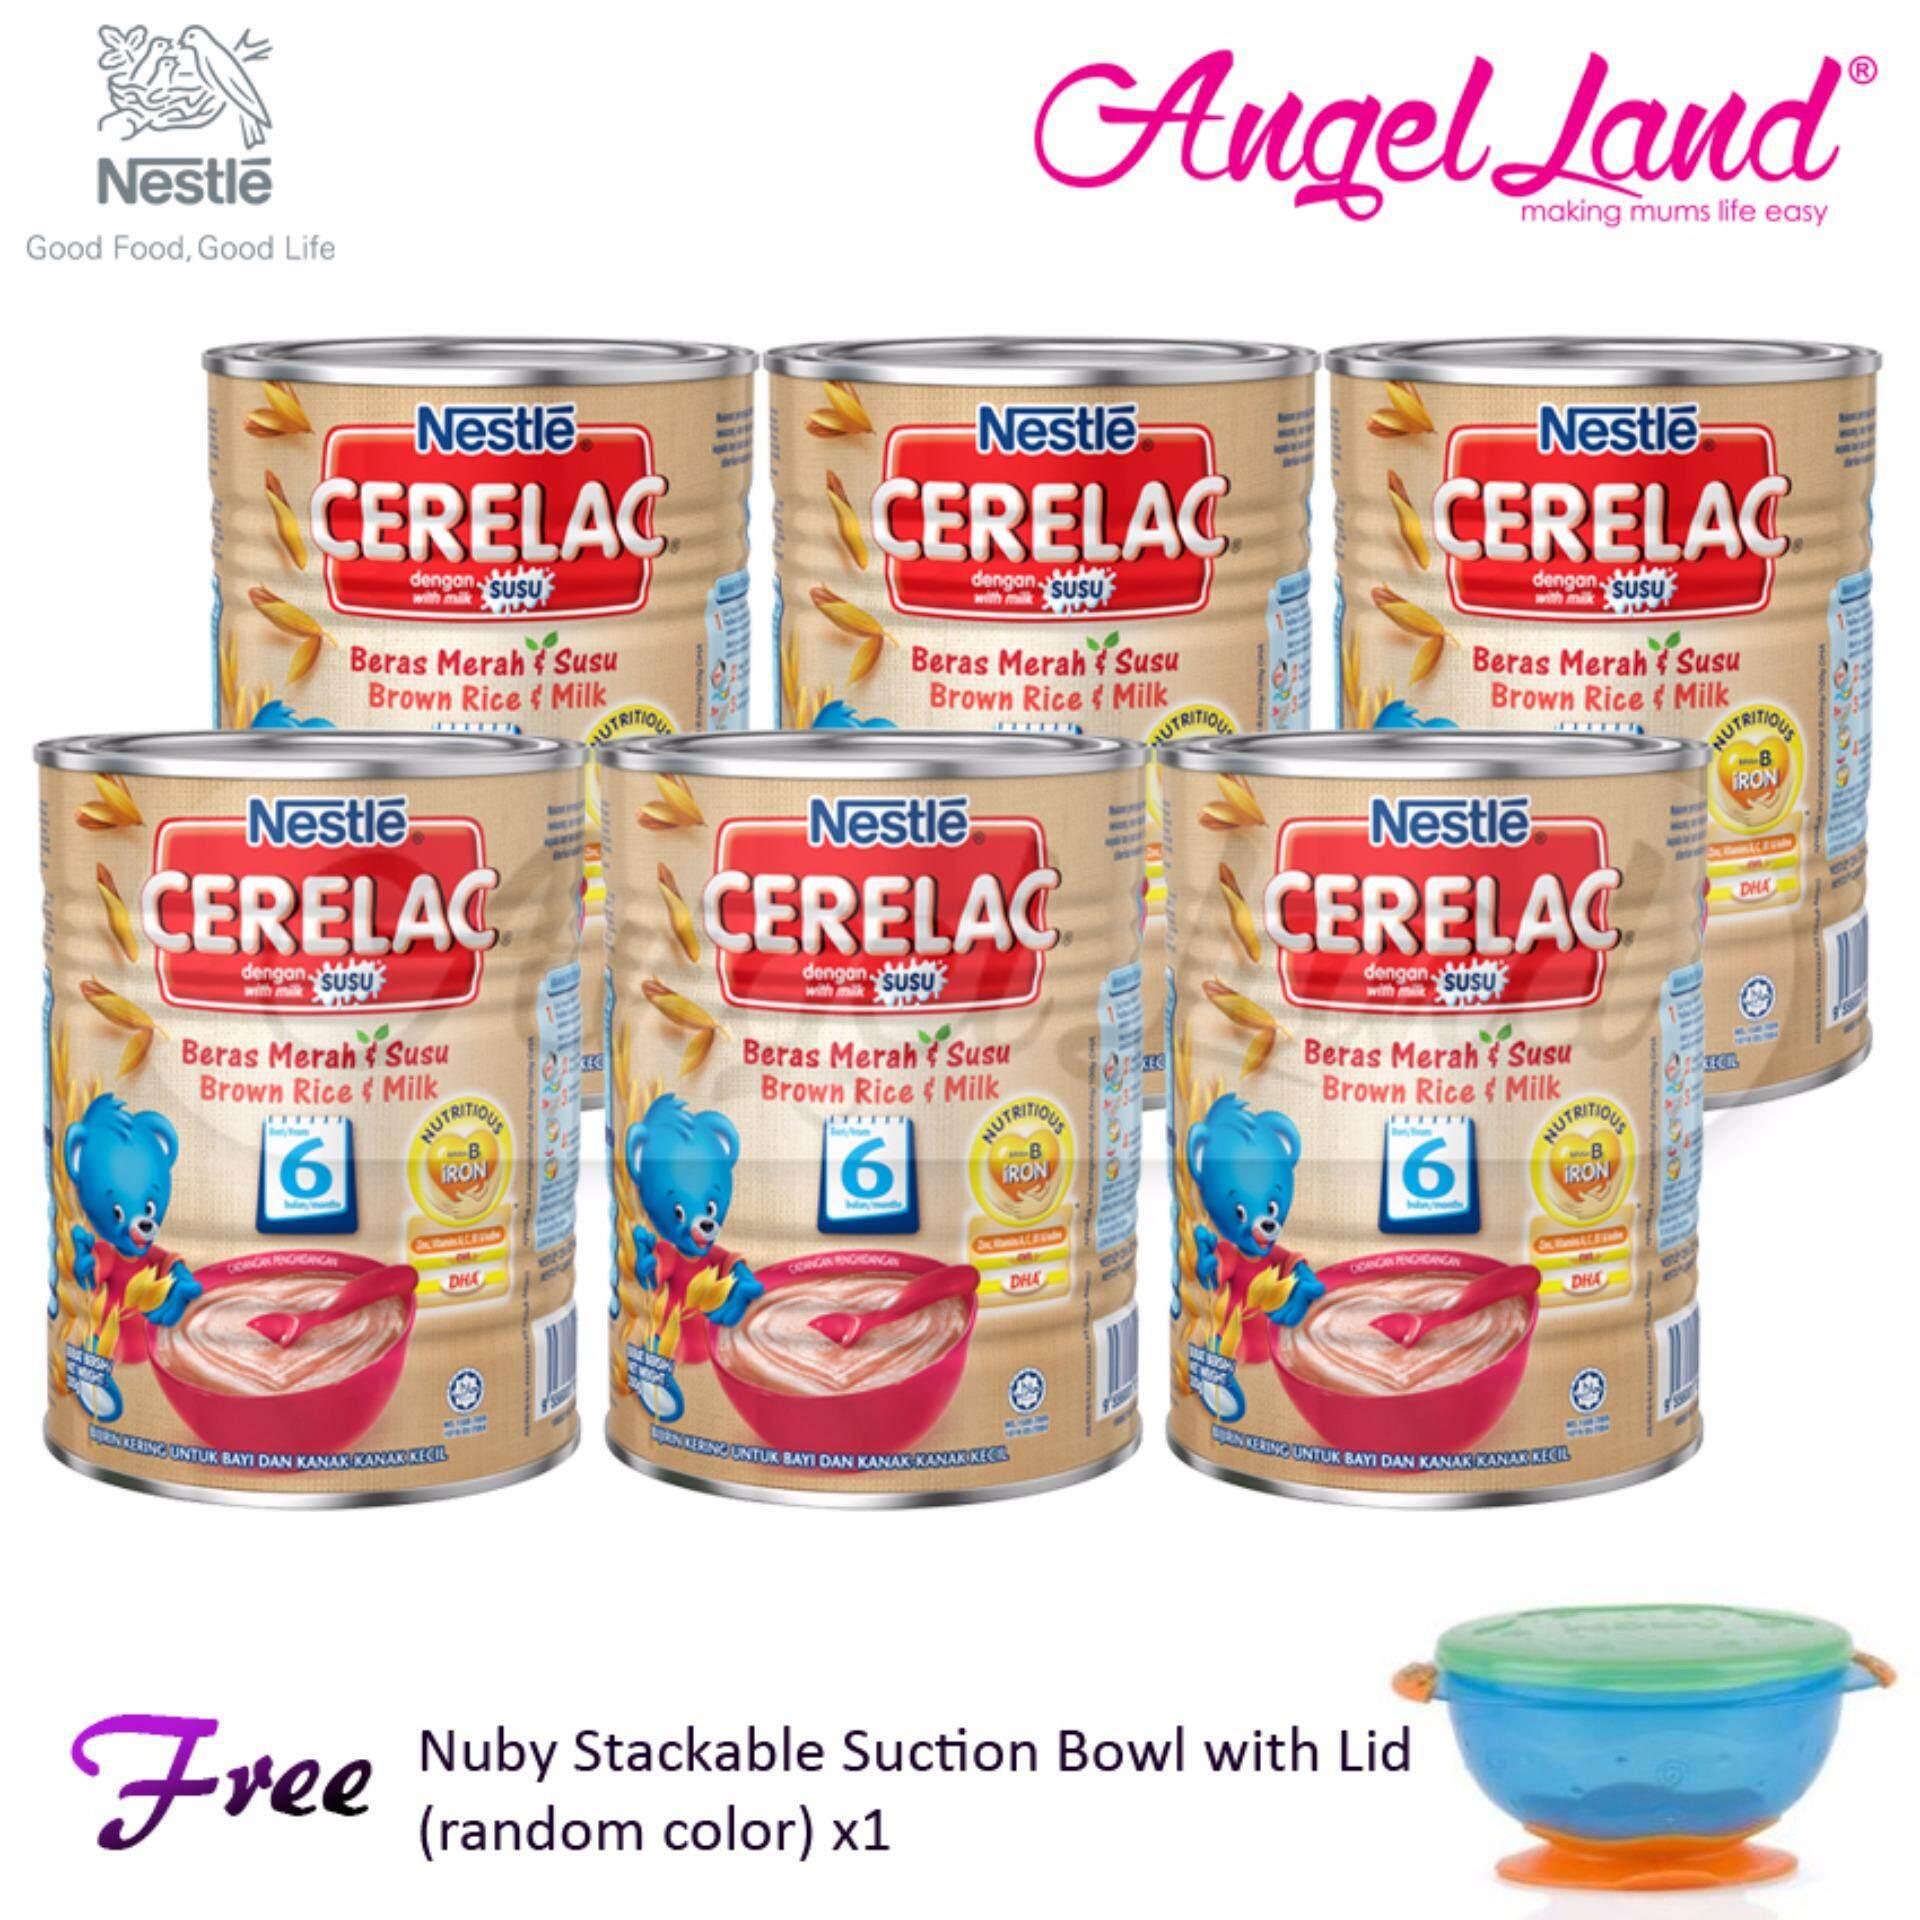 [Buy 6 Cerelac Free Bowl] Cerelac Brown Rice & Milk 6m+ (350g) x6 + FOC 1 Nuby Stackable Suction Bowl (random)